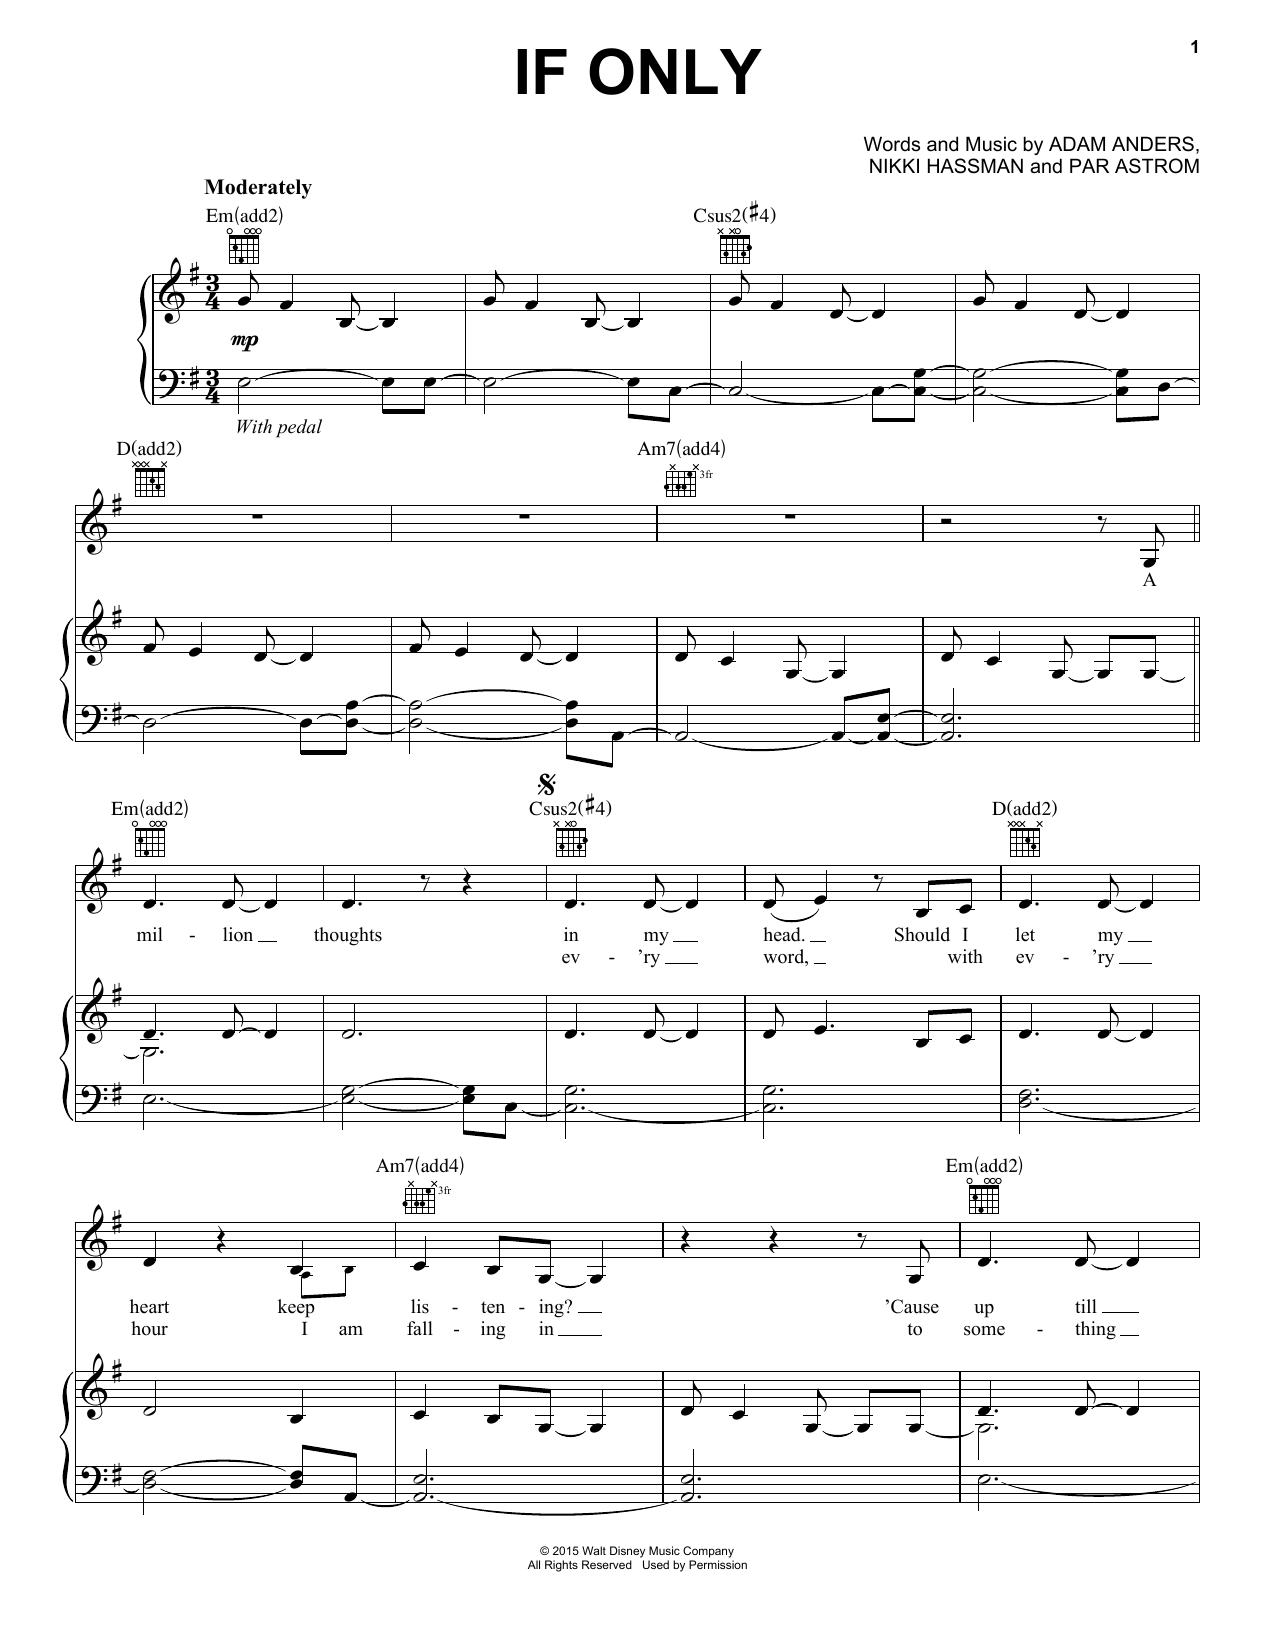 Dove cameron if only sheet music notes chords piano vocal dove cameron if only sheet music notes chords piano vocal guitar right hand melody download children 162596 pdf baditri Choice Image